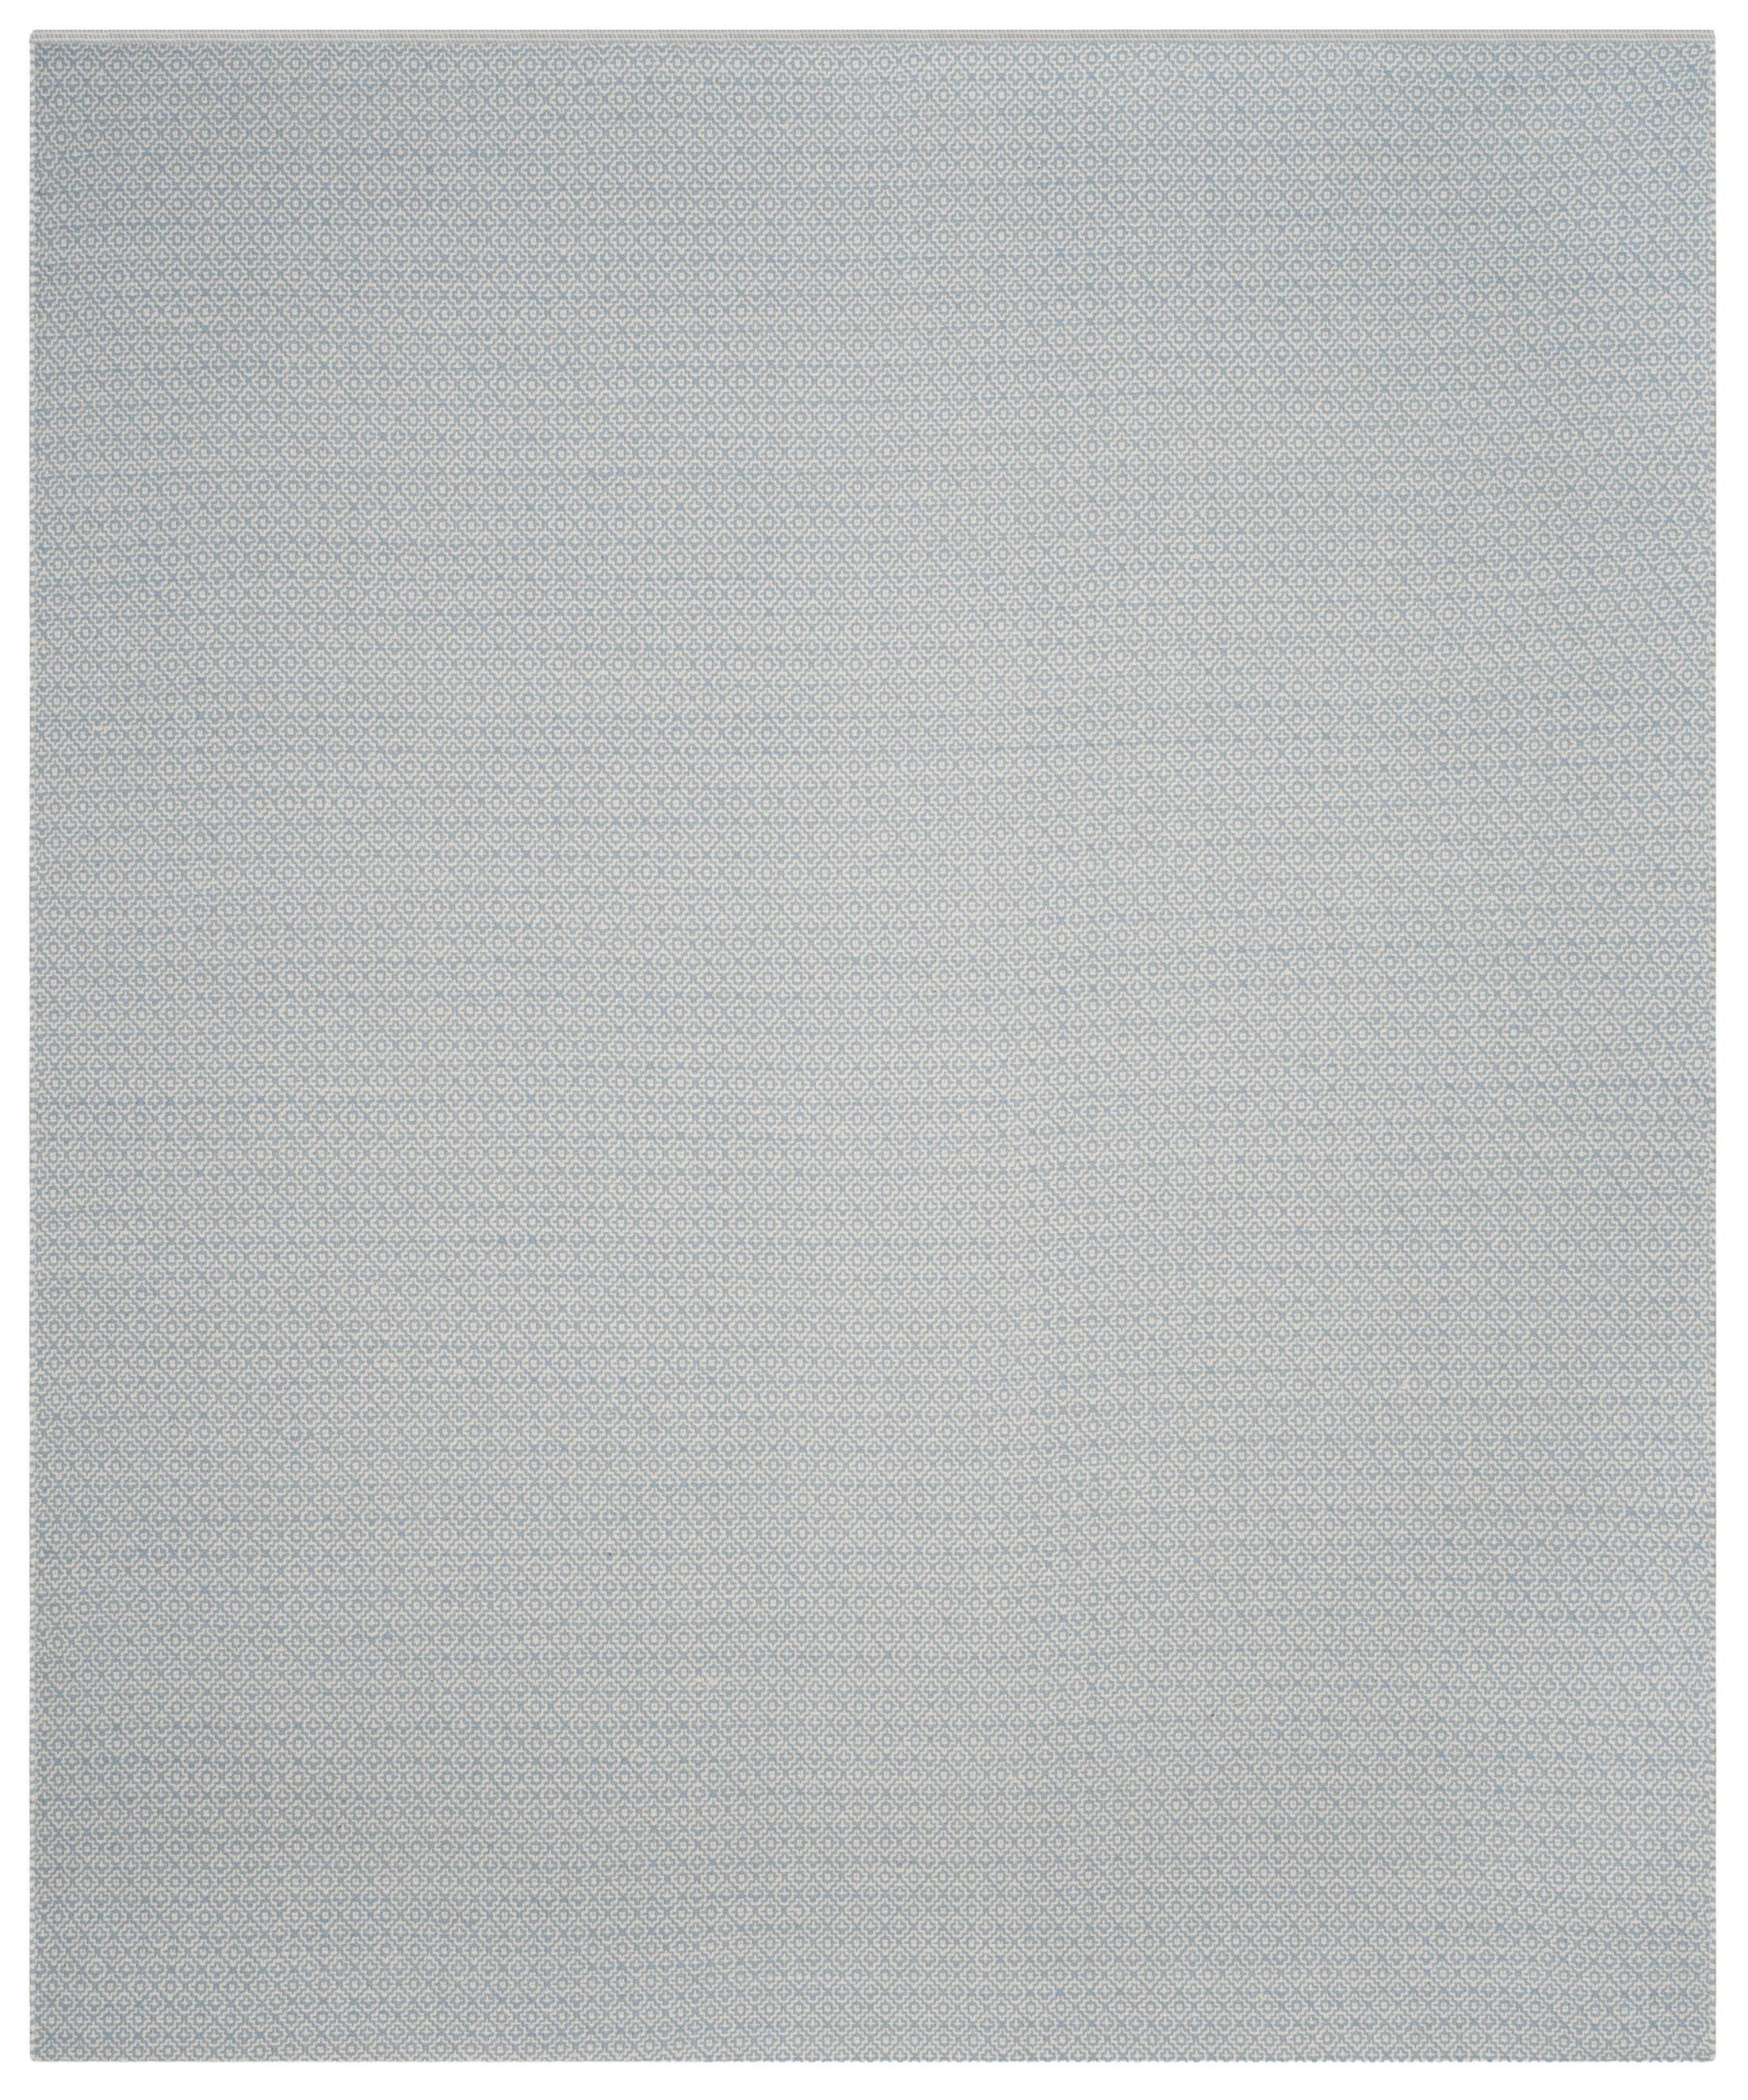 Oxbow Hand-Woven Ivory/Light Blue Area Rug Rug Size: Rectangle 5' x 7'